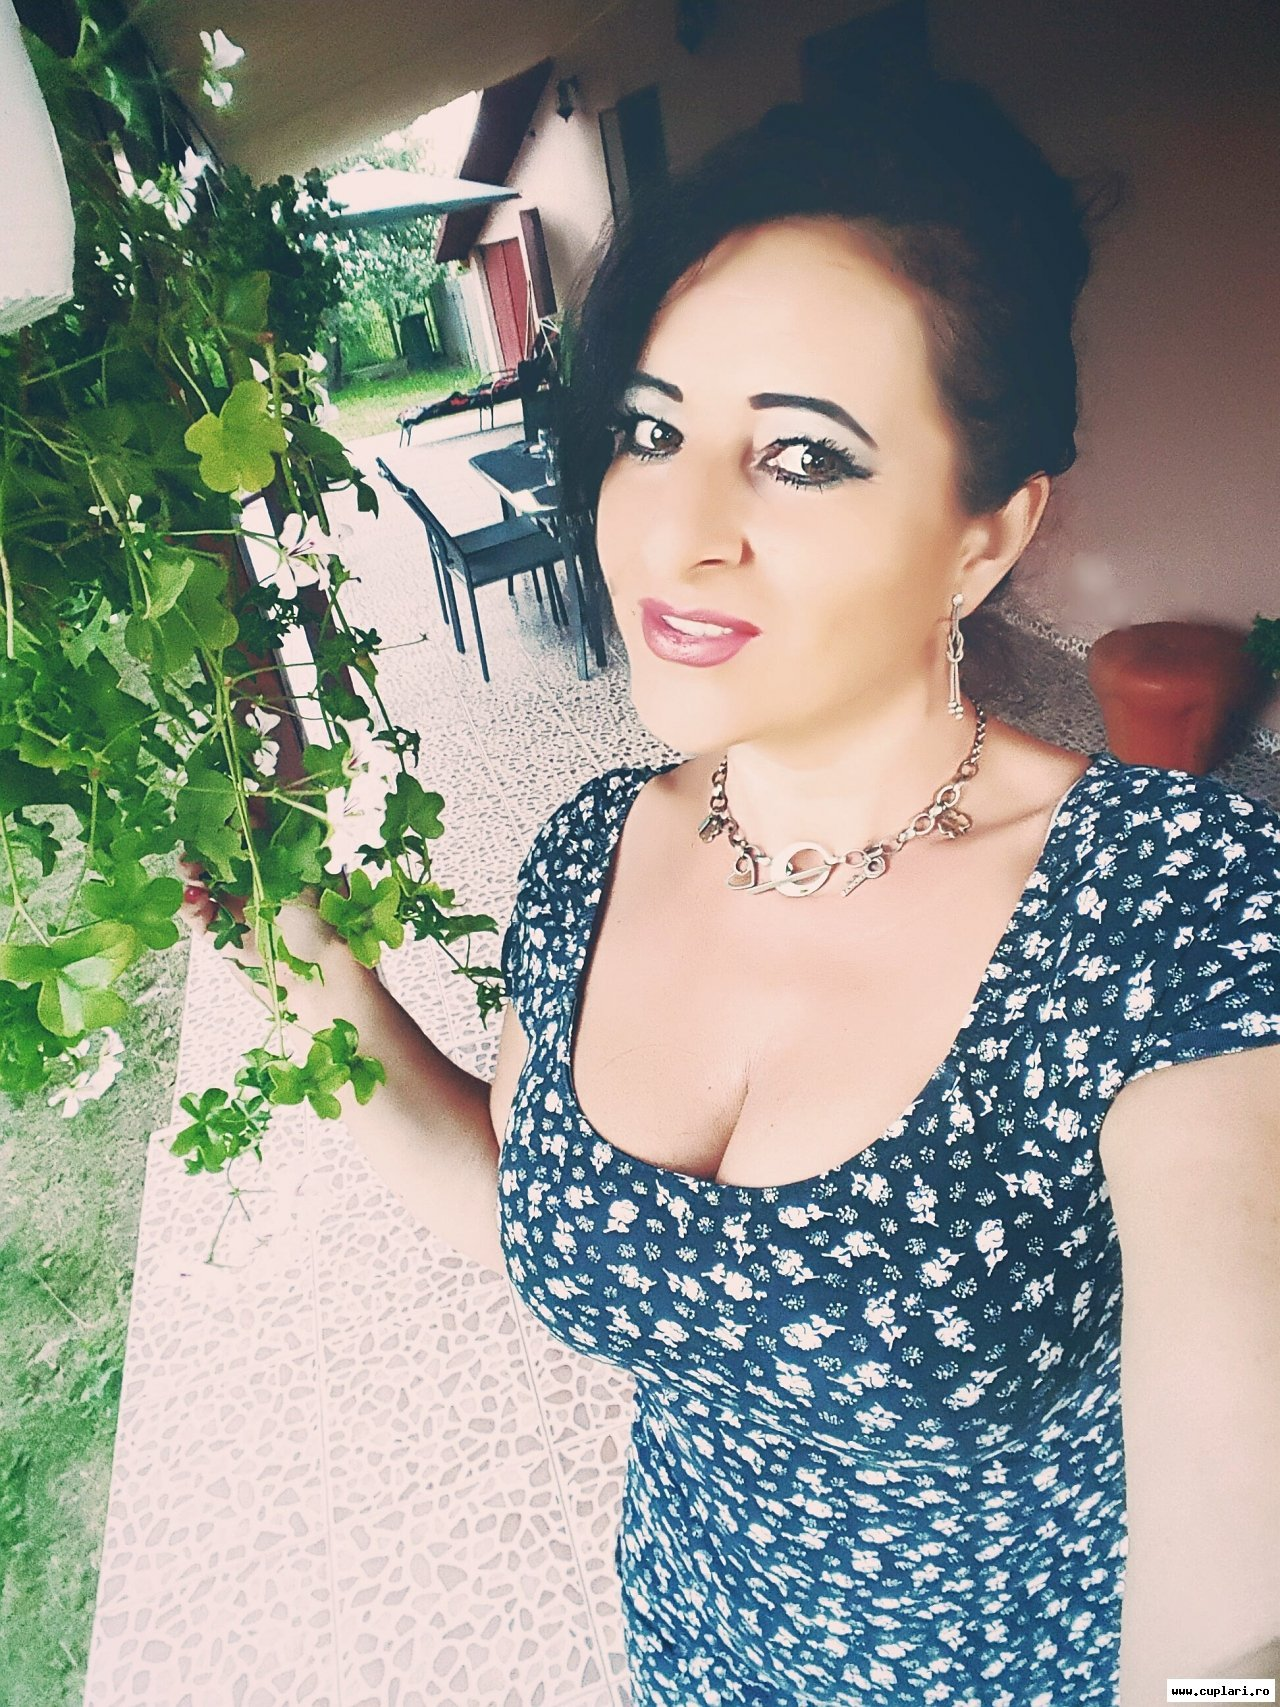 femeie doresc casatorie)